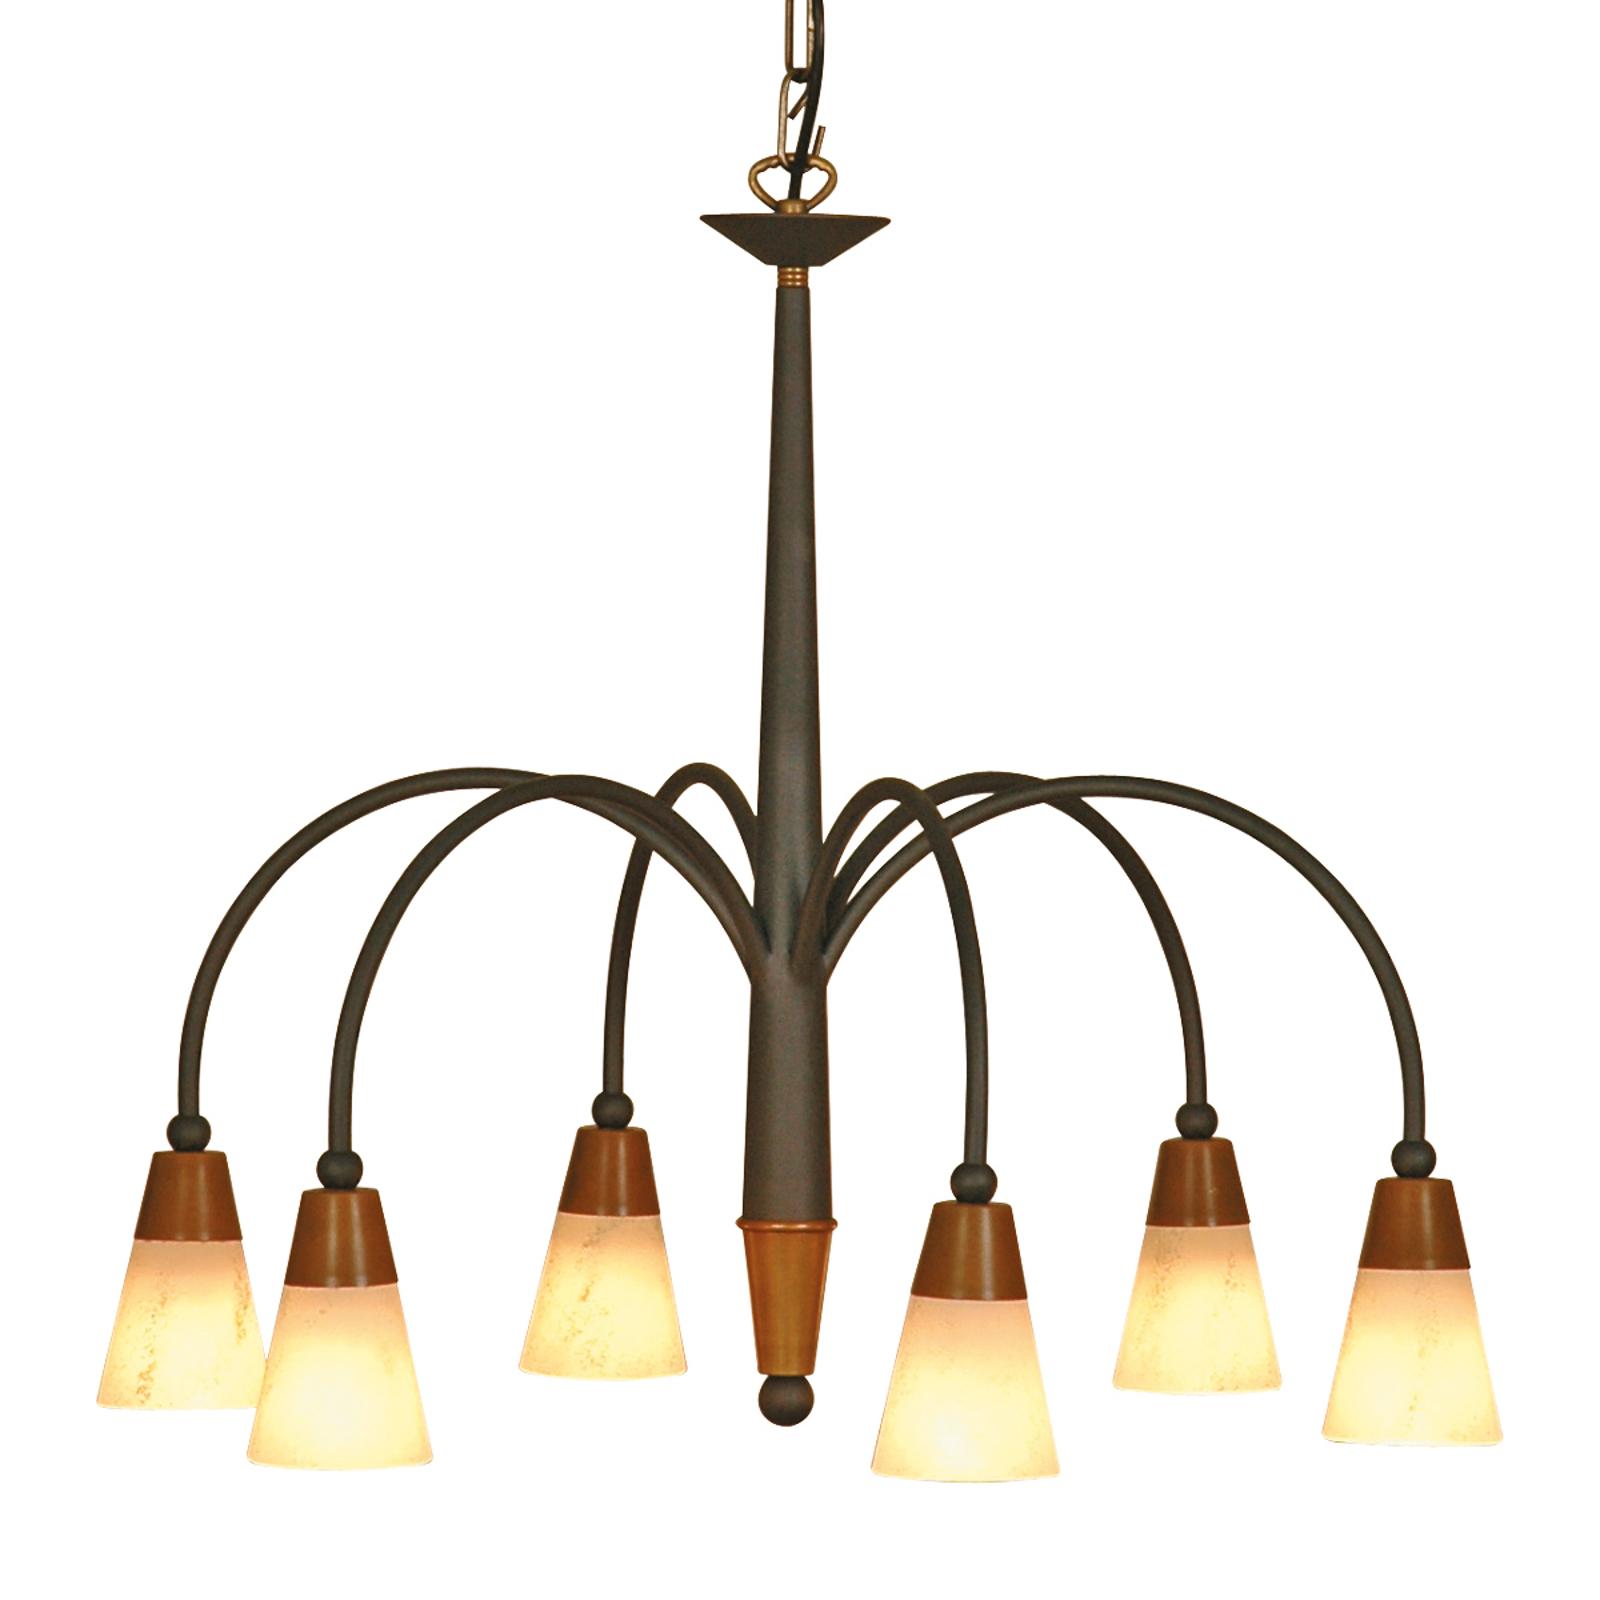 Kroonvormige hanglamp STELLA, 6-lichts